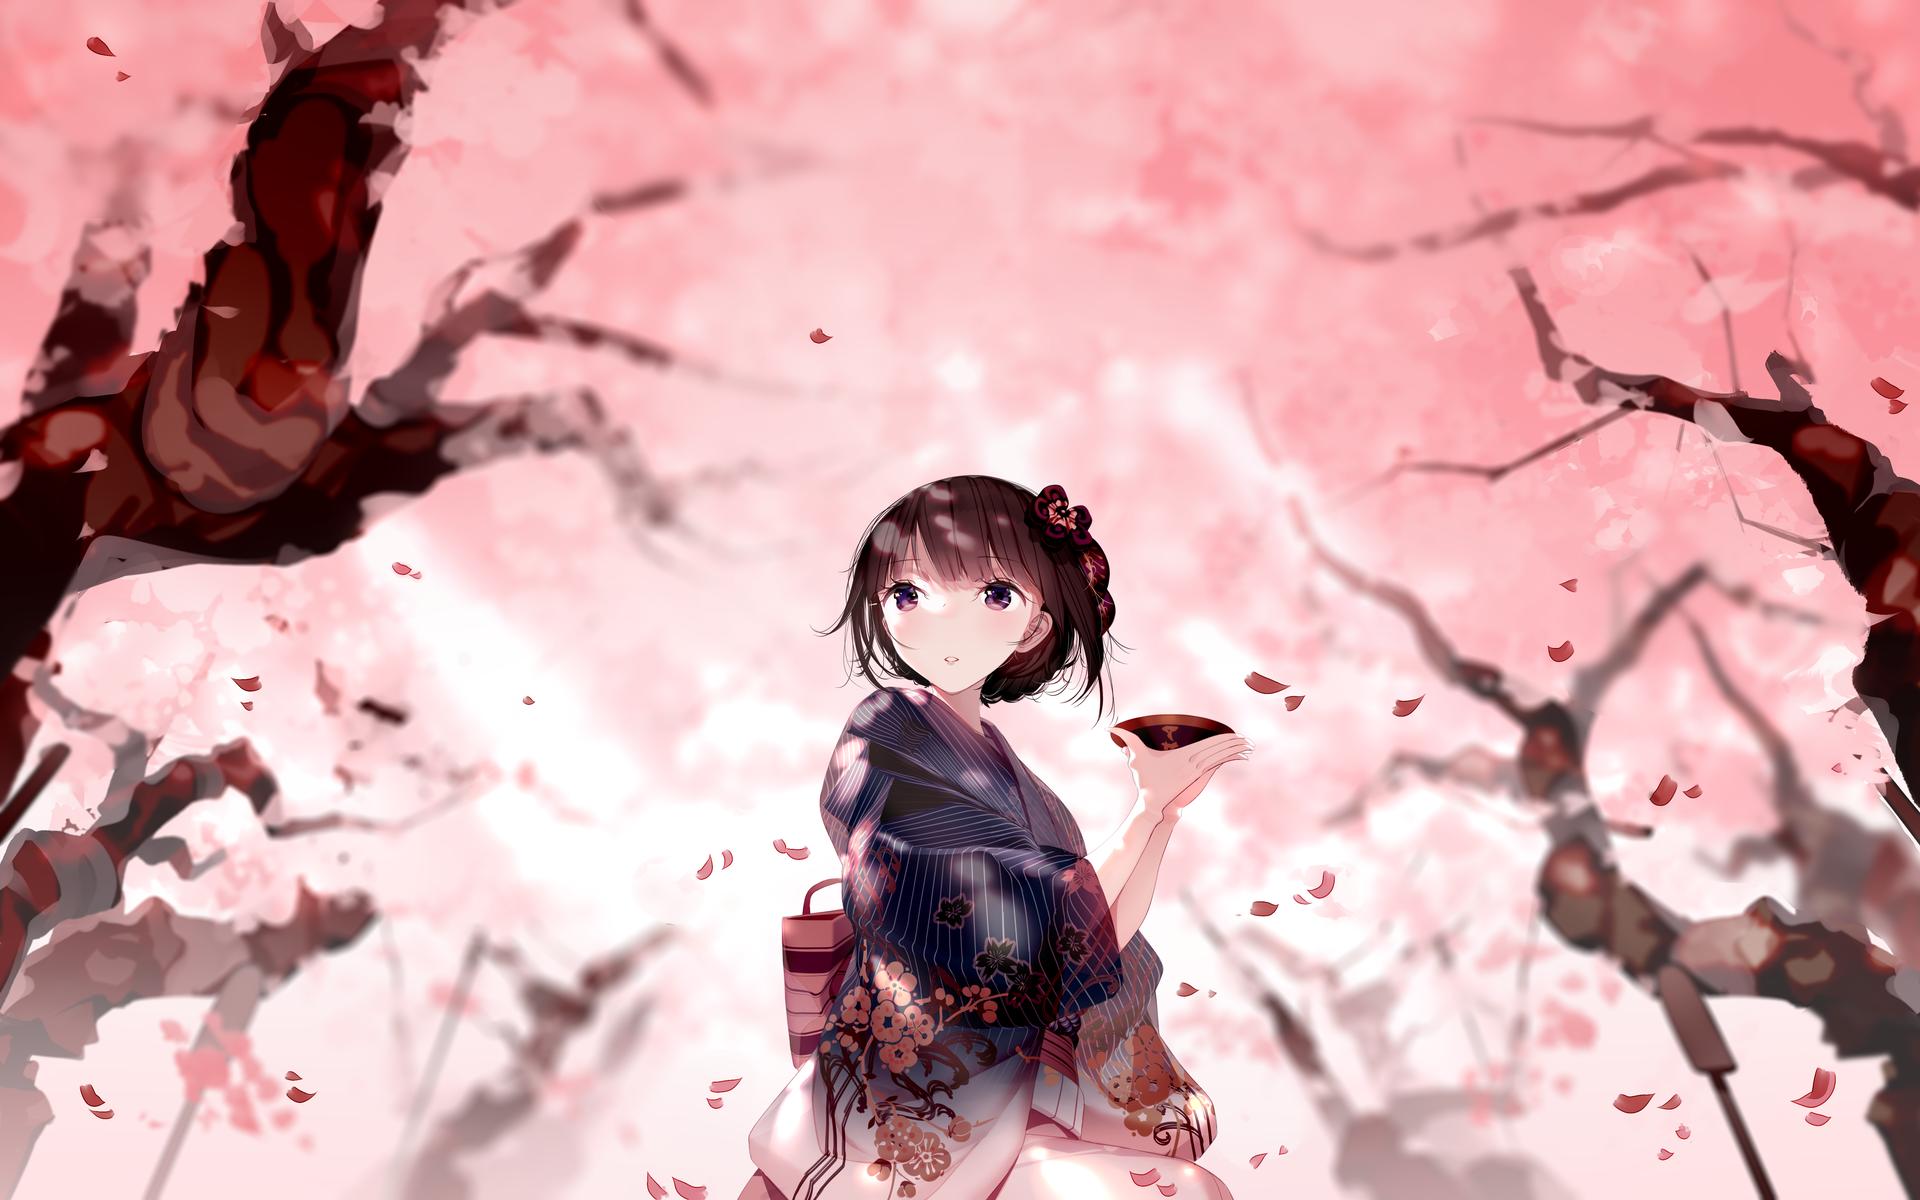 Anime 1920x1200 anime girls original characters anime brunette bangs looking away kimono depth of field cherry blossom spring trees artwork digital art drawing 2D illustration Atha